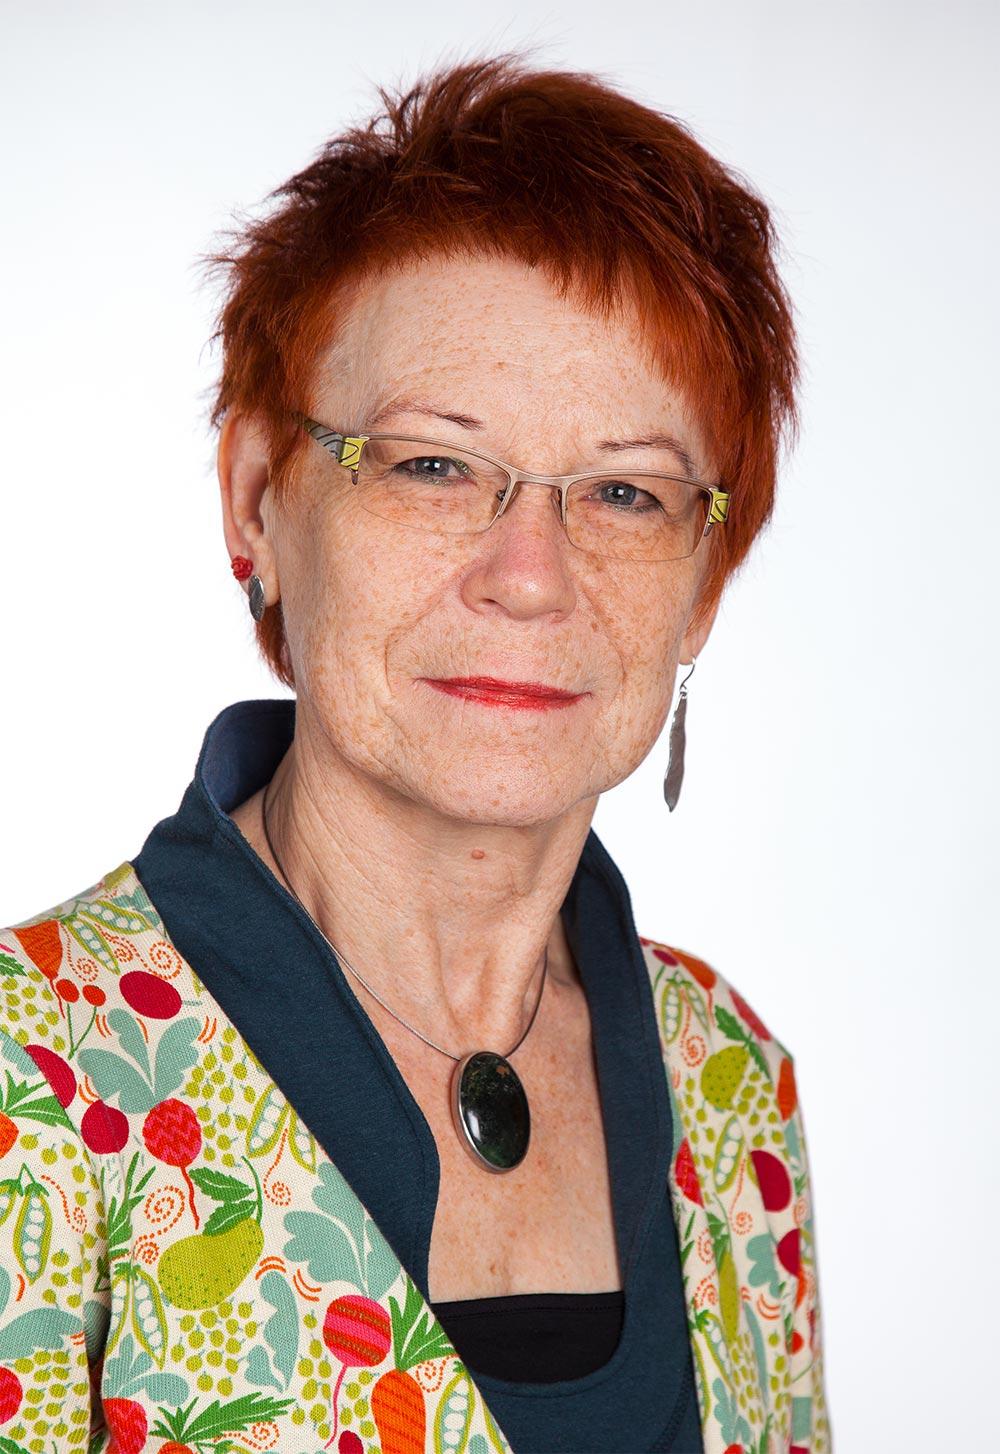 Frau Eggeling-Herms